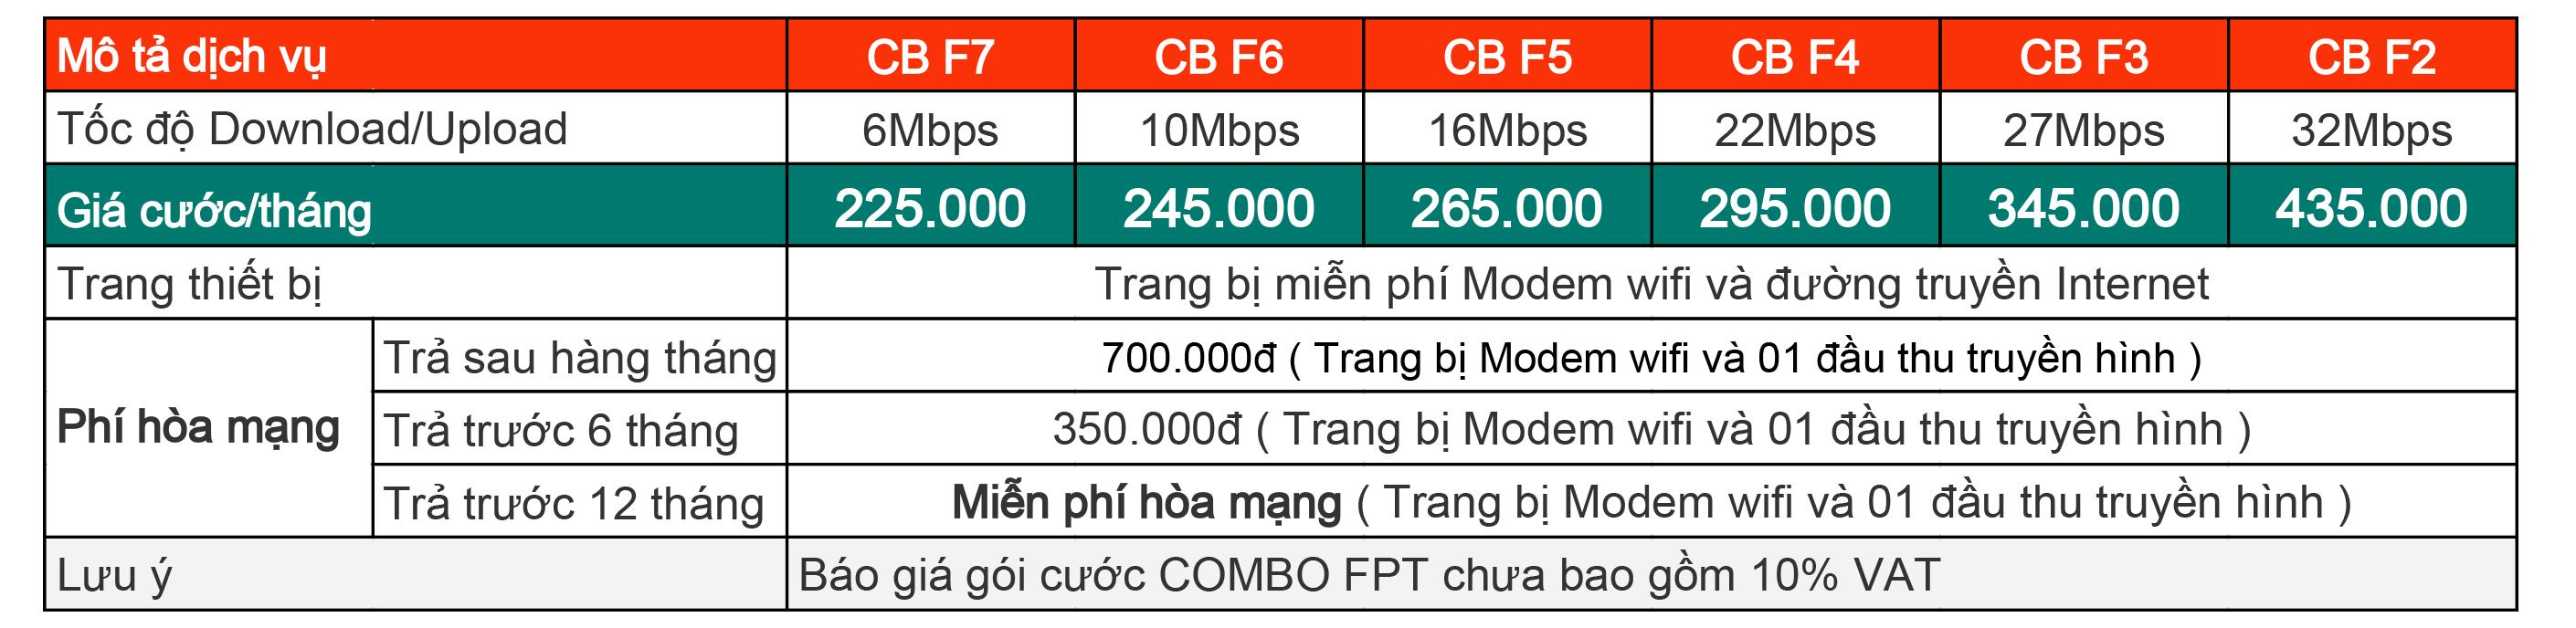 Gói cước Internet COMBO FPT